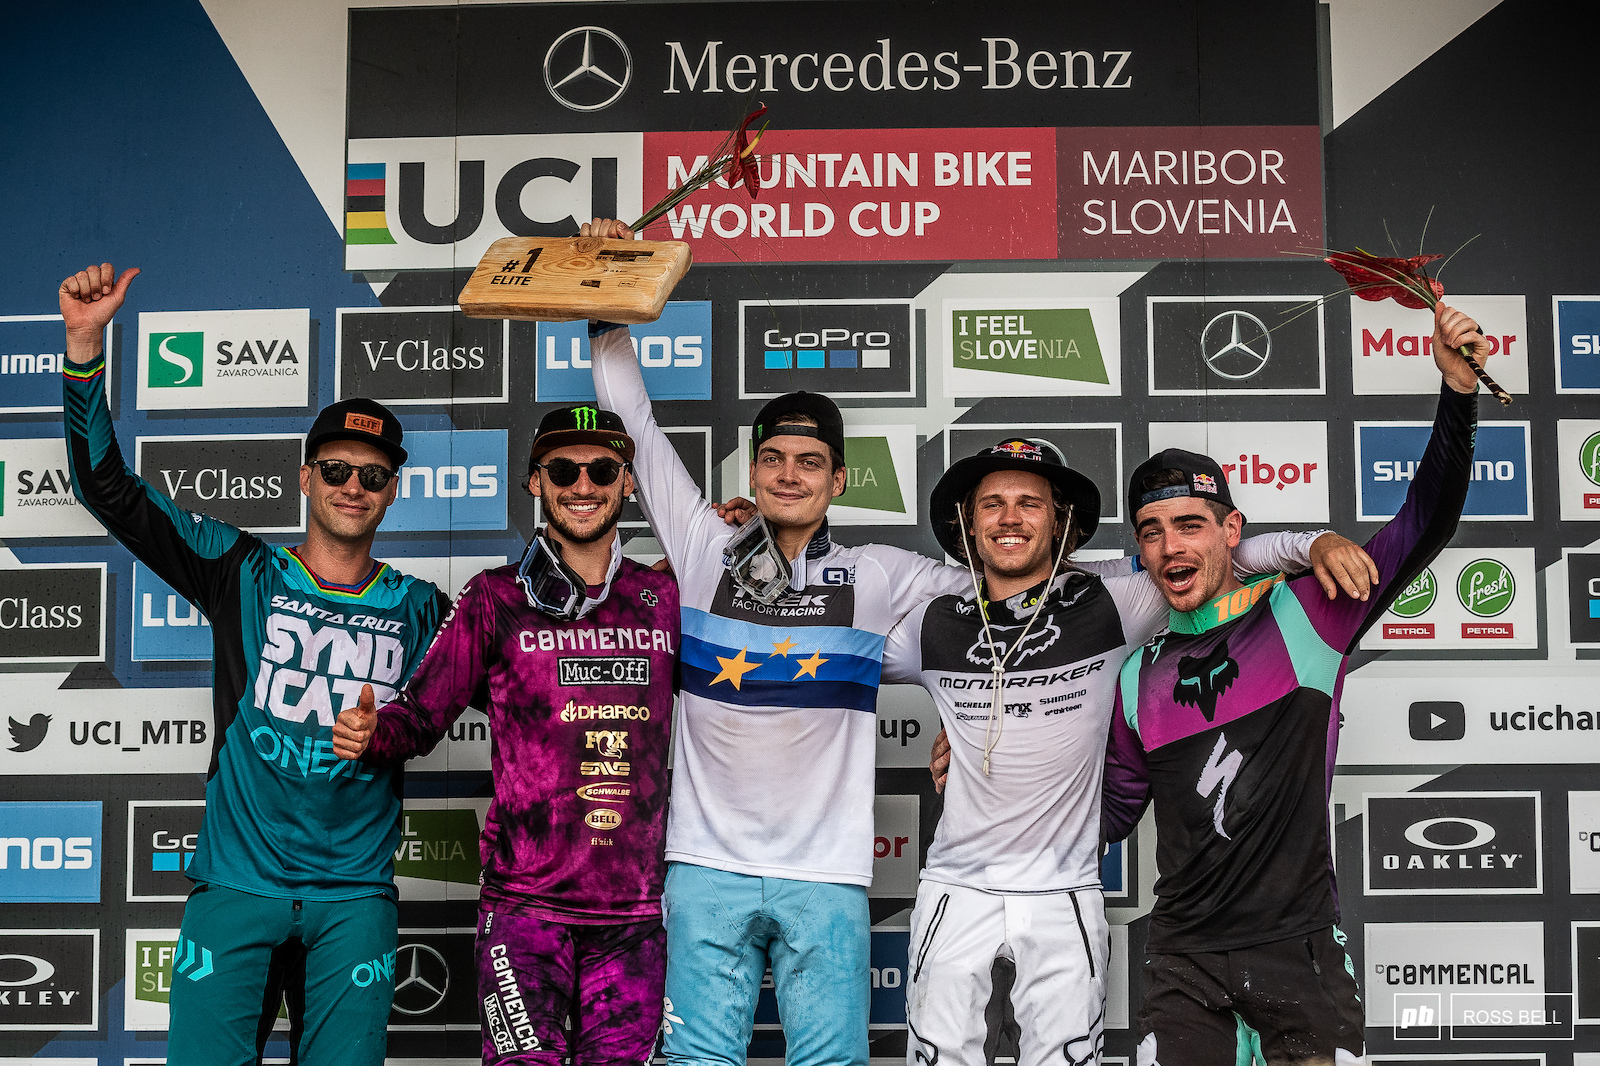 Your top 5 men 1st Loris Vergier 2nd Thibaut Daprela 3rd Laurie Greenland 4th Greg Minnaar 5th Loic Bruni